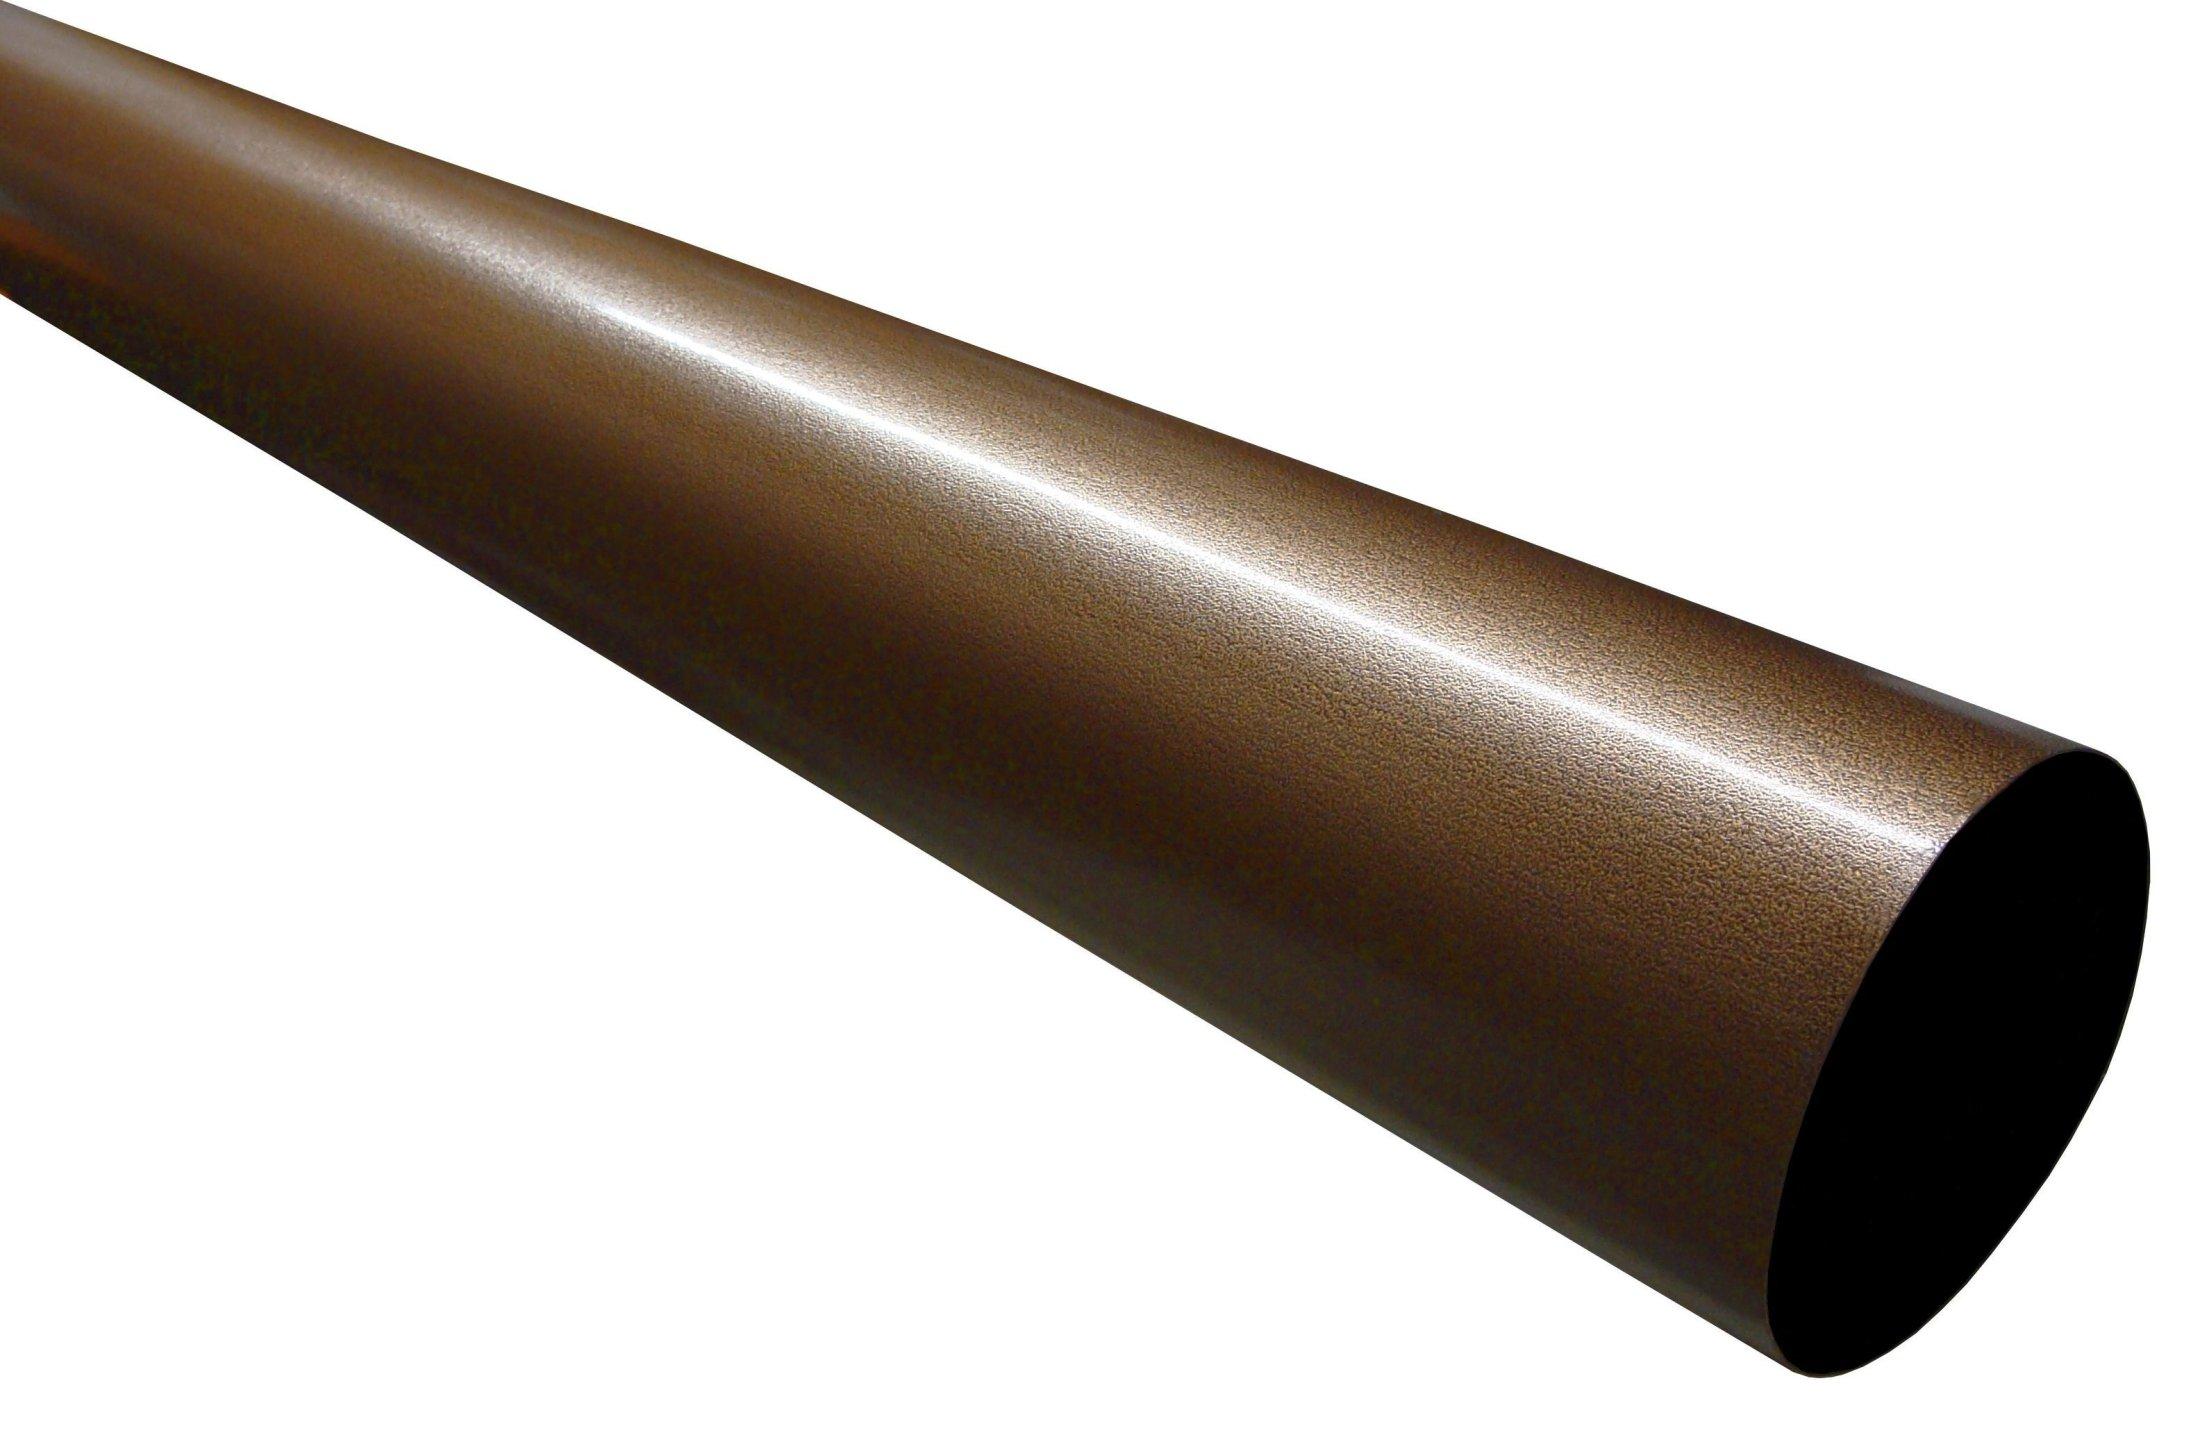 Our Plain Round Designer Copper Aluminum Downspouts Are